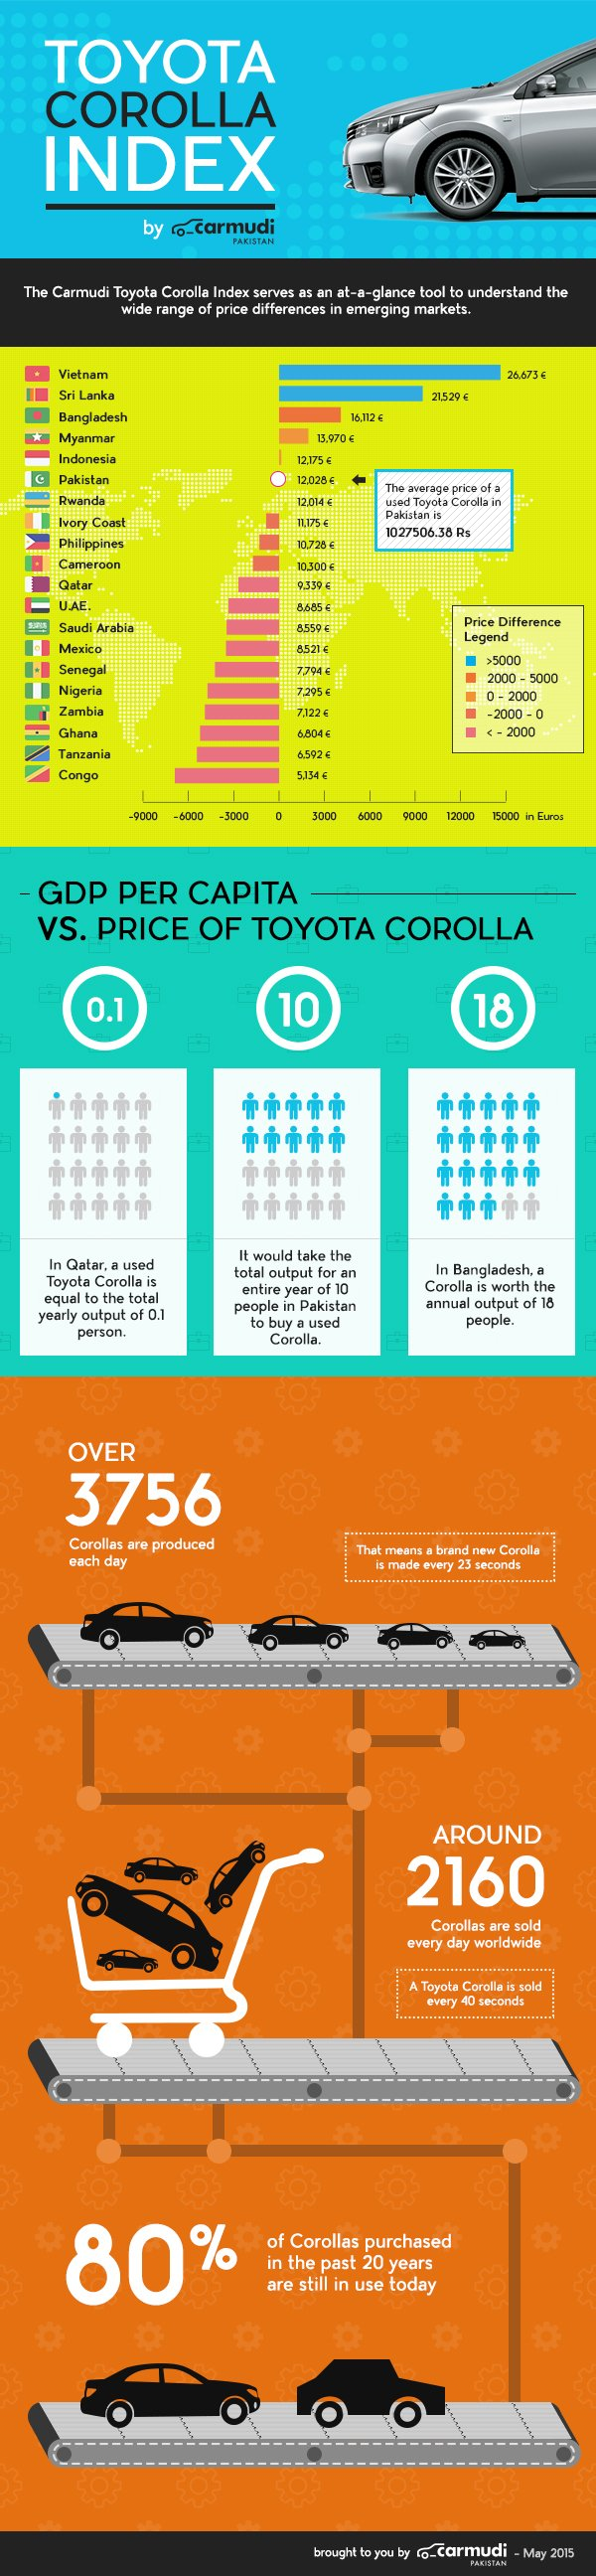 Carmudi's Toyota Corolla Index - Infographic